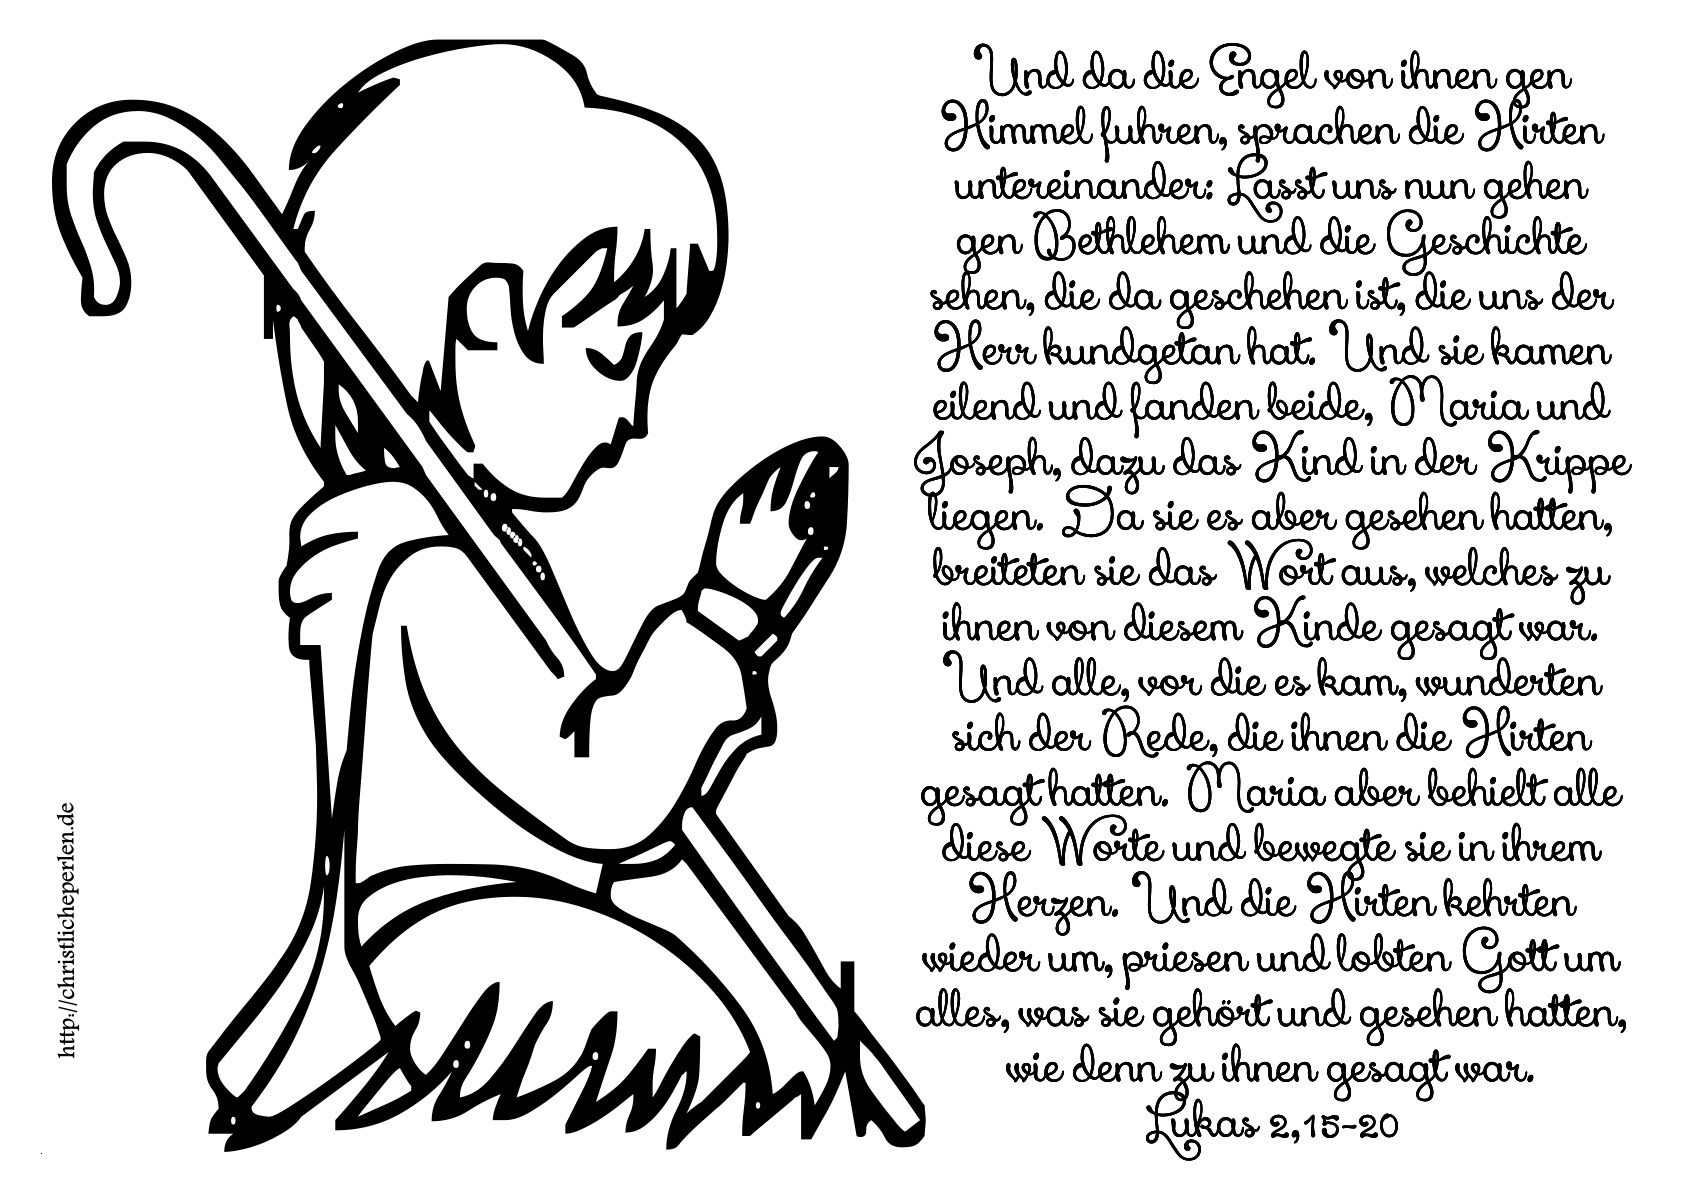 Pippi Langstrumpf Ausmalbilder Genial Peter Pan Malbuch Ideal Ausmalbilder Zu Weihnachten Best Bild